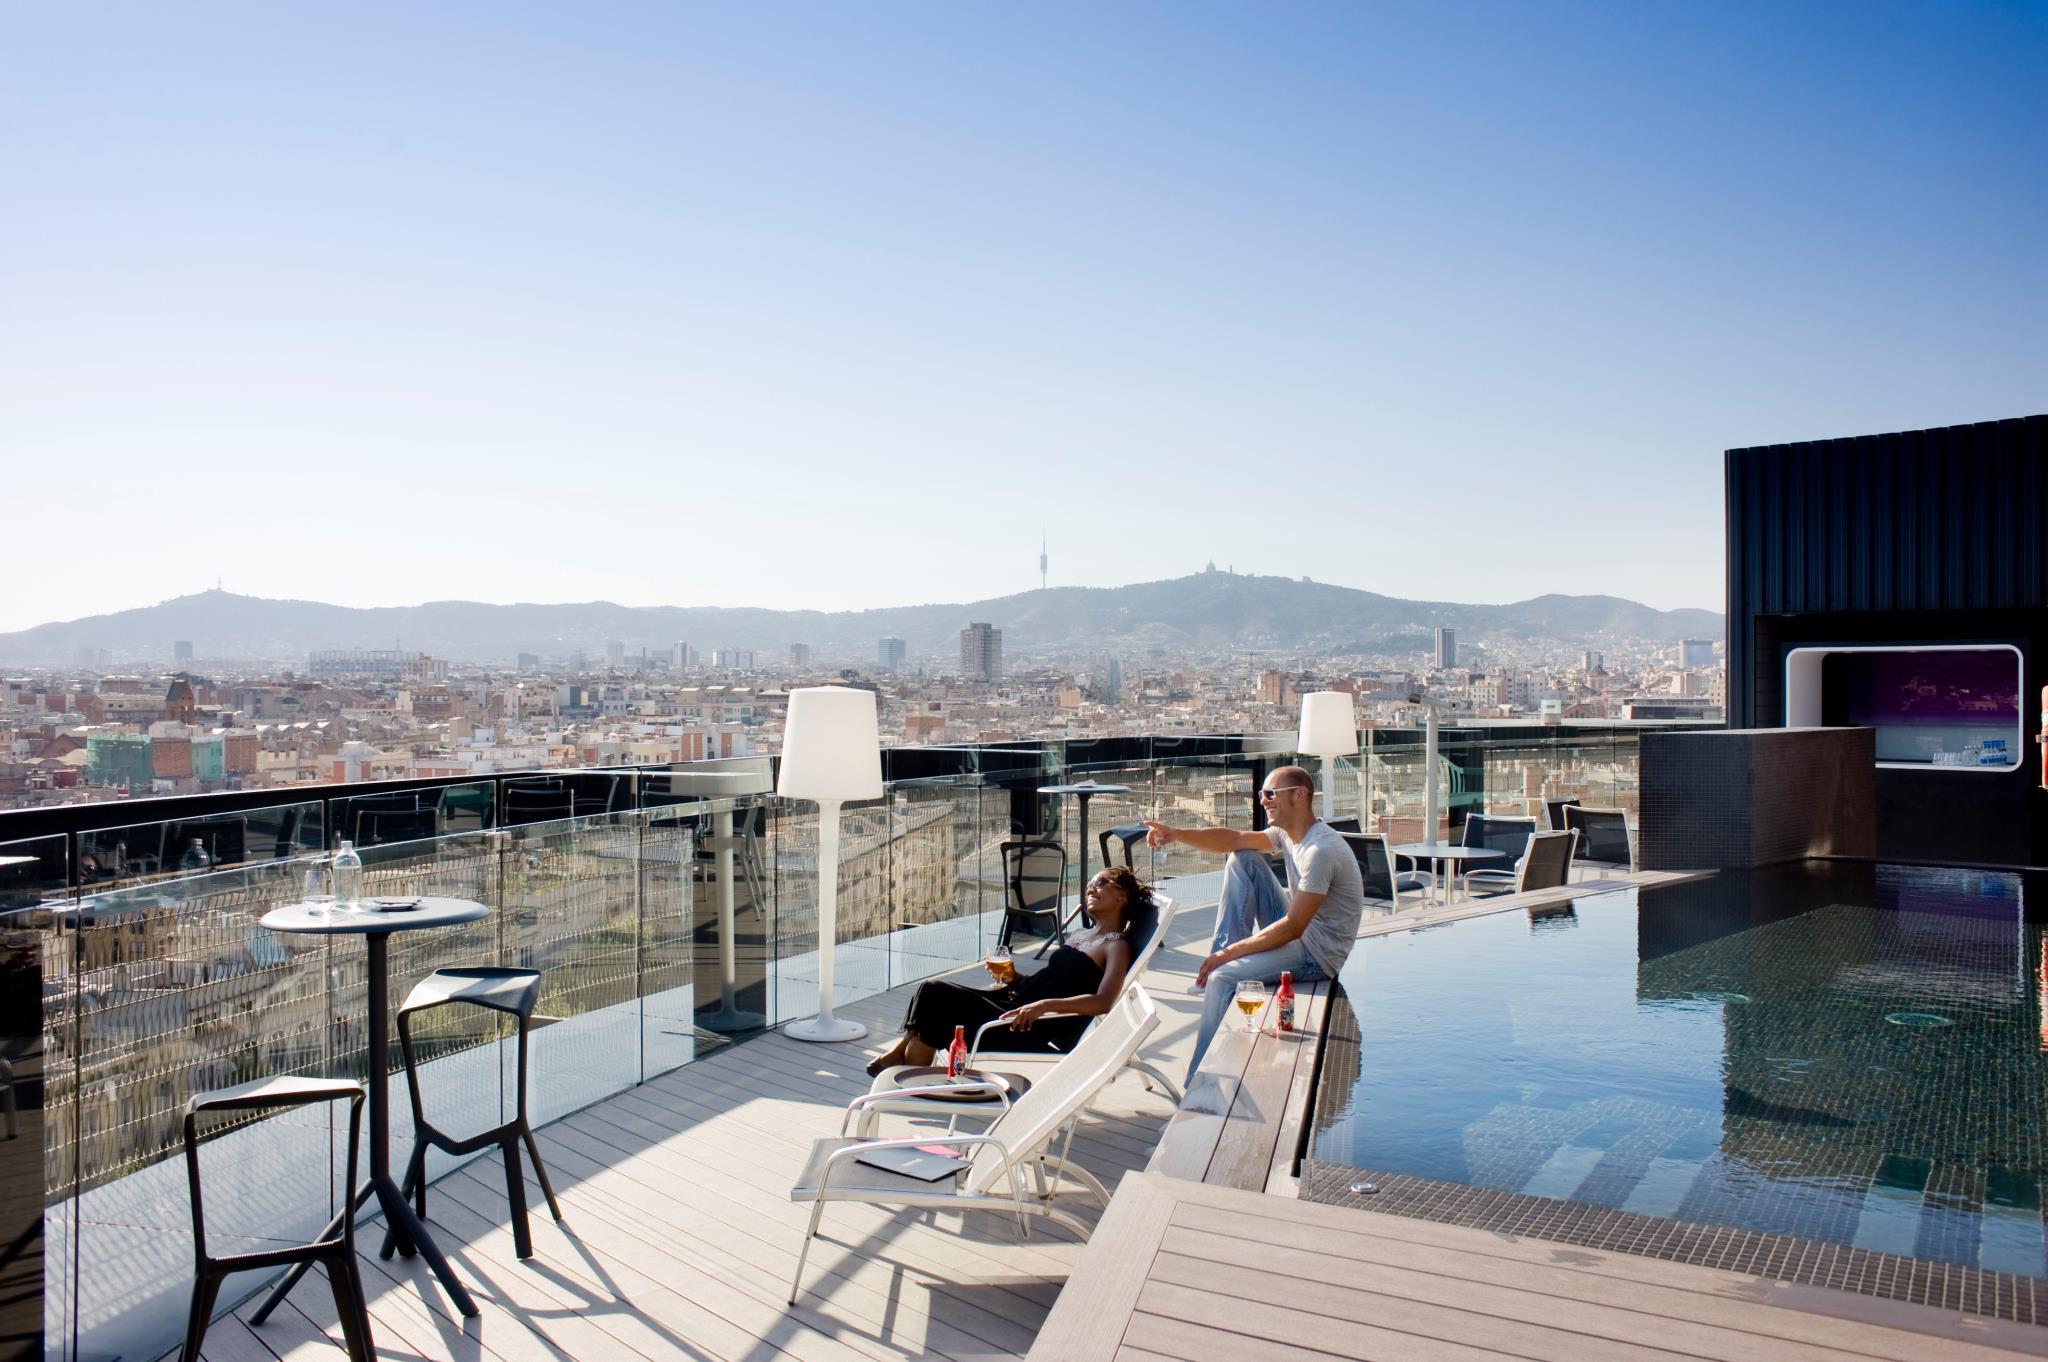 Terraza 360 hotel barcelo raval terrazeo for La terraza de la casa barranquilla telefono